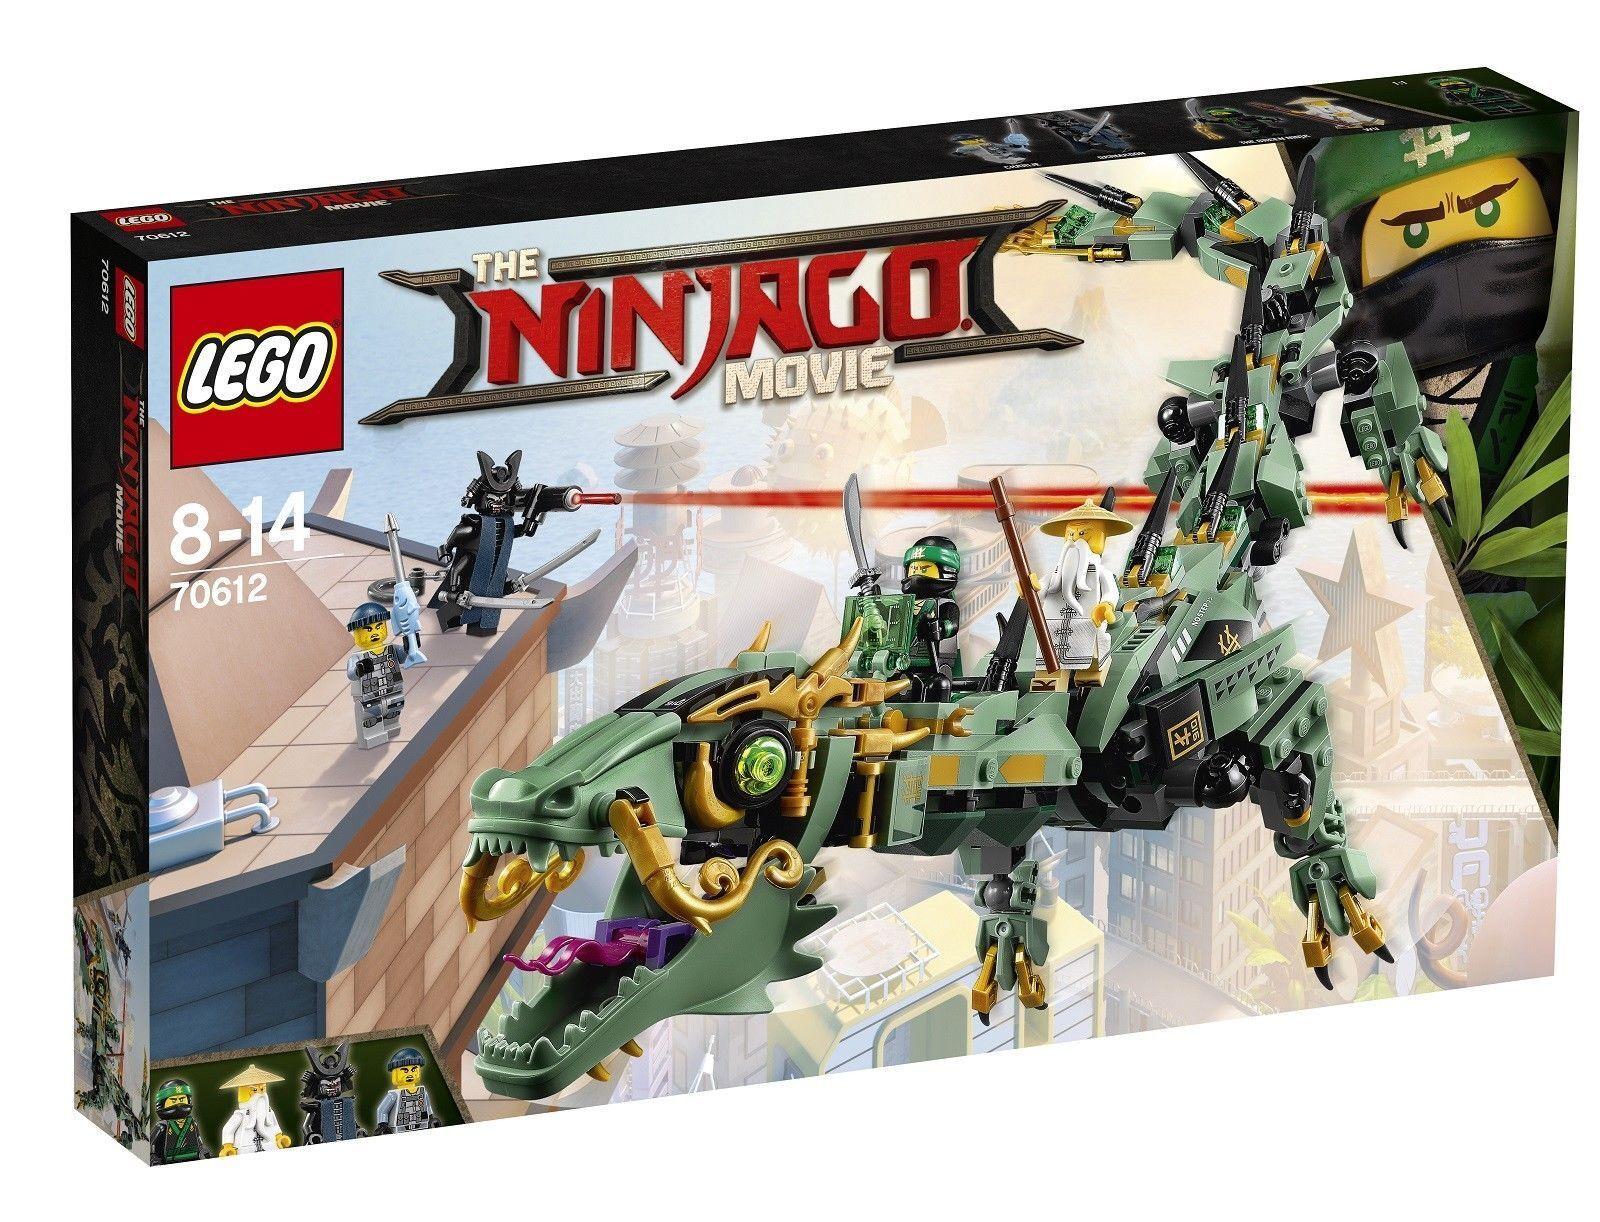 LEGO Ninjago 70612 - Green Mech Dragon - New & Sealed